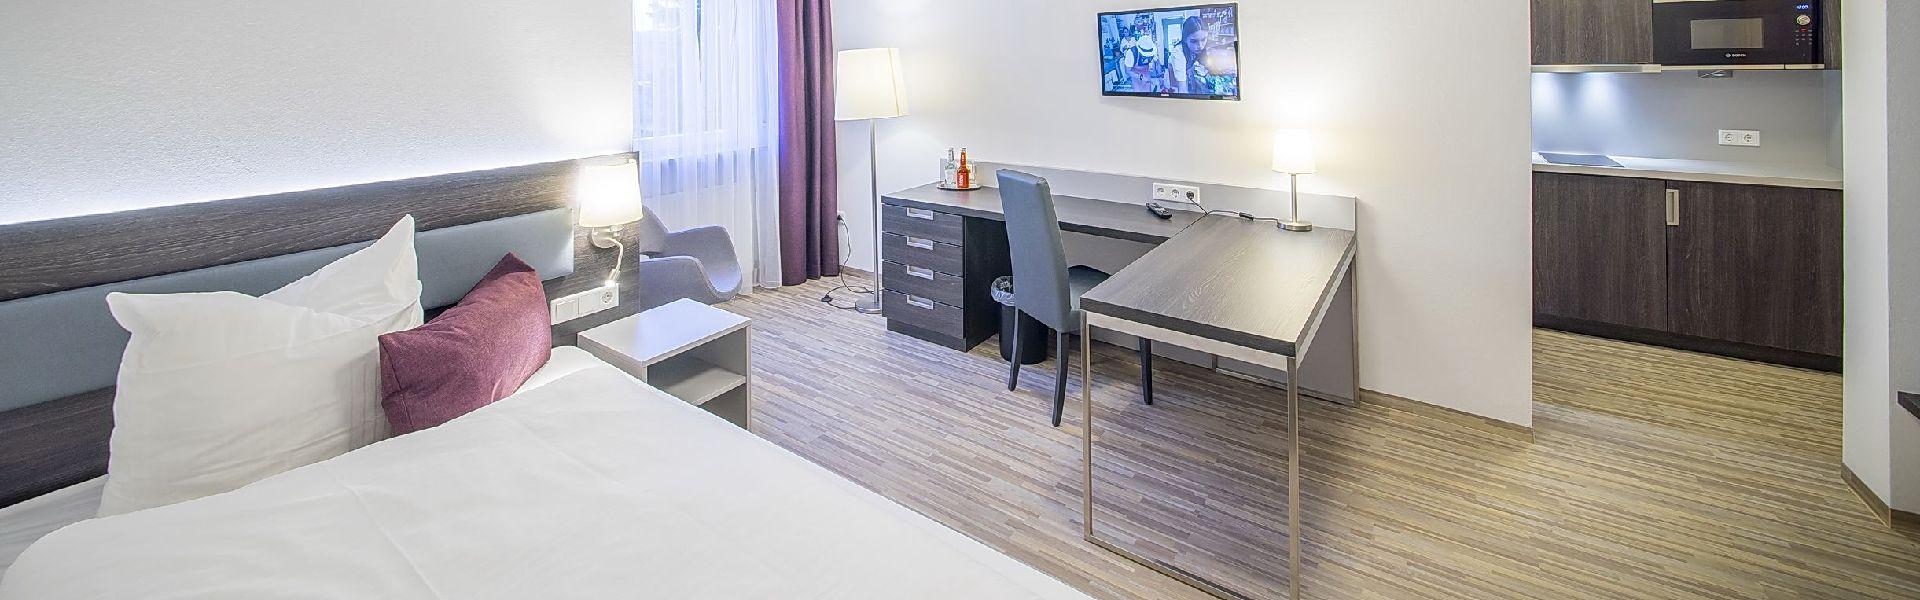 Boarding-Haus-Zimmer